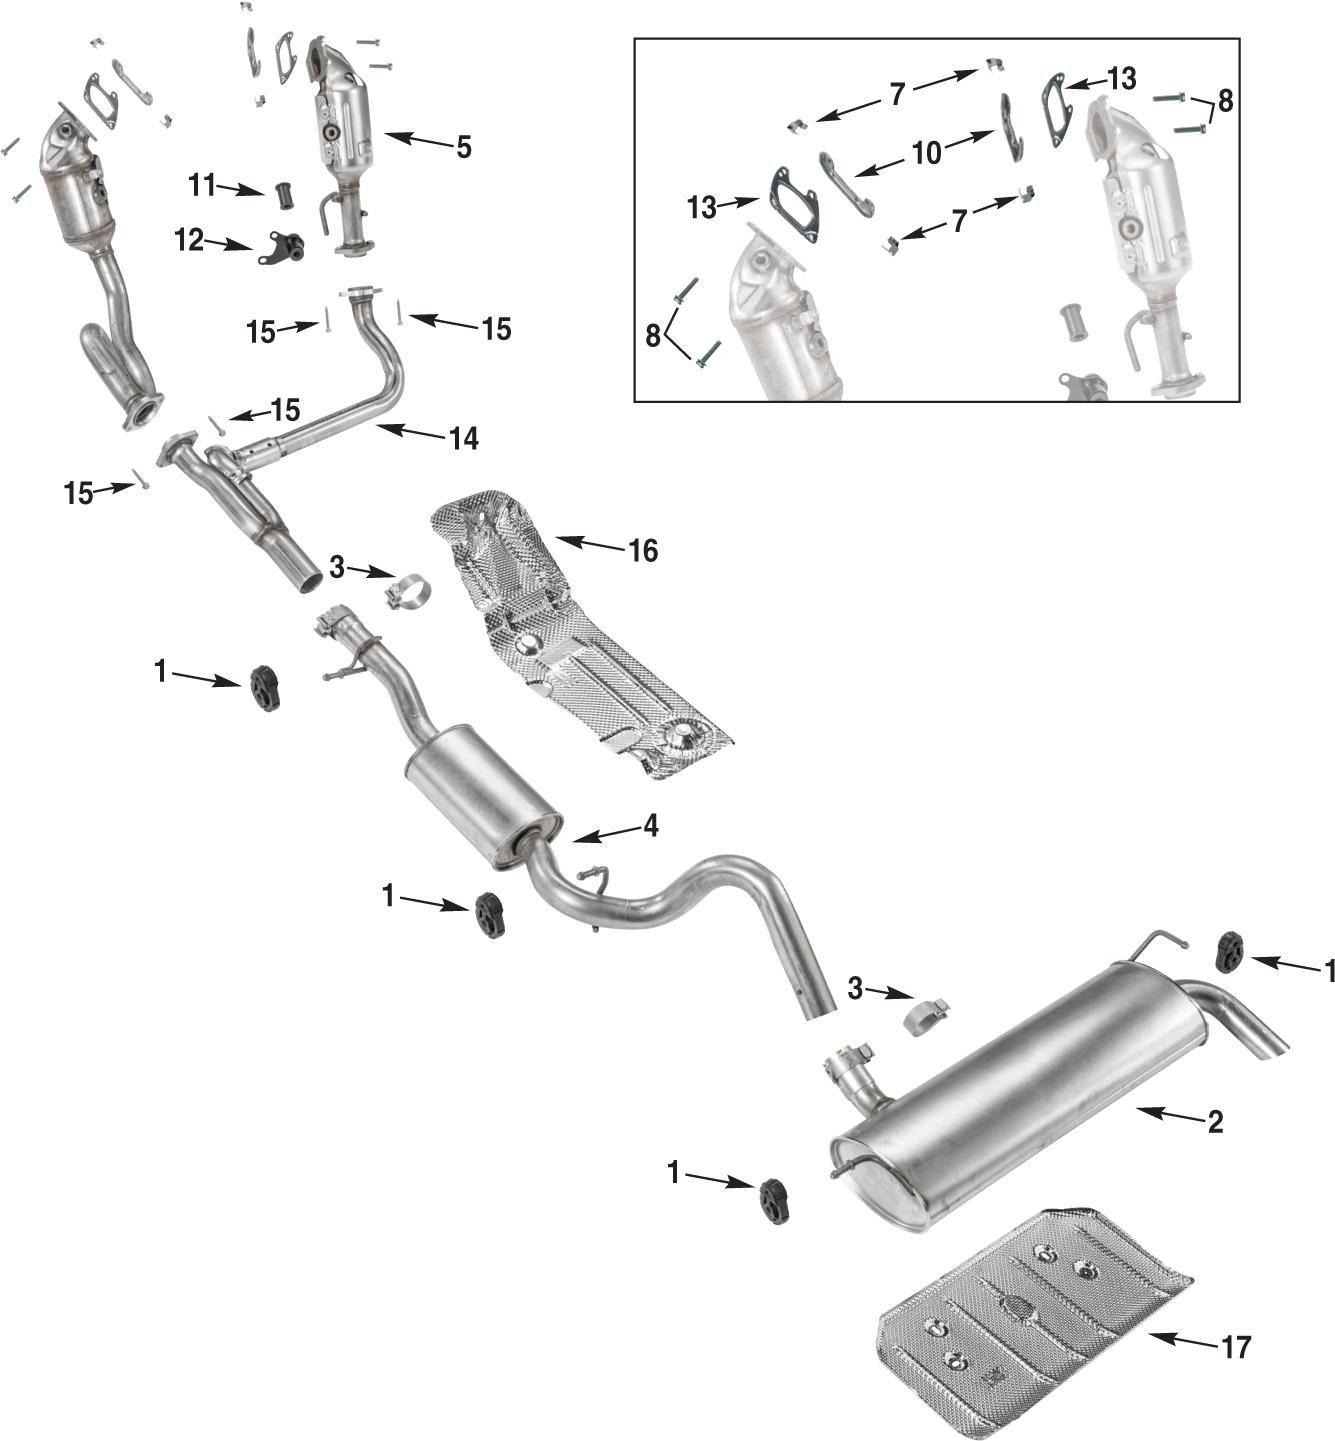 medium resolution of jeep exhaust diagram wiring diagram blog 2012 jeep wrangler exhaust diagram jeep exhaust diagram